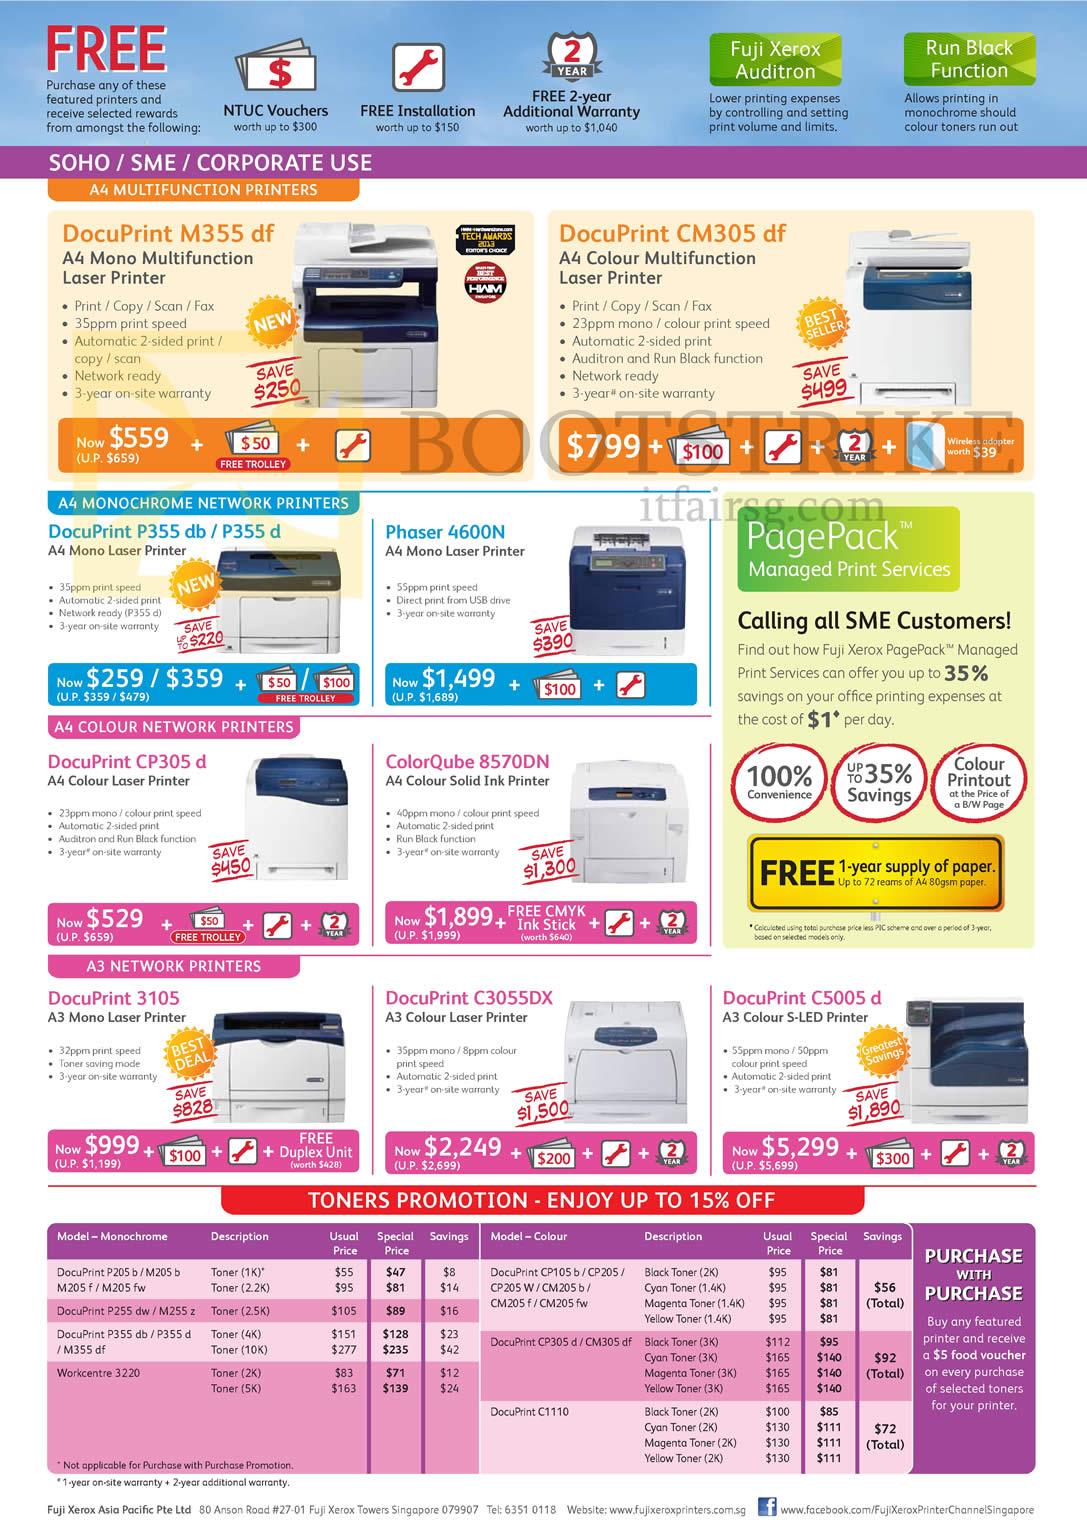 fujifilm fuji xerox printers docuprint m355 df cm305 df